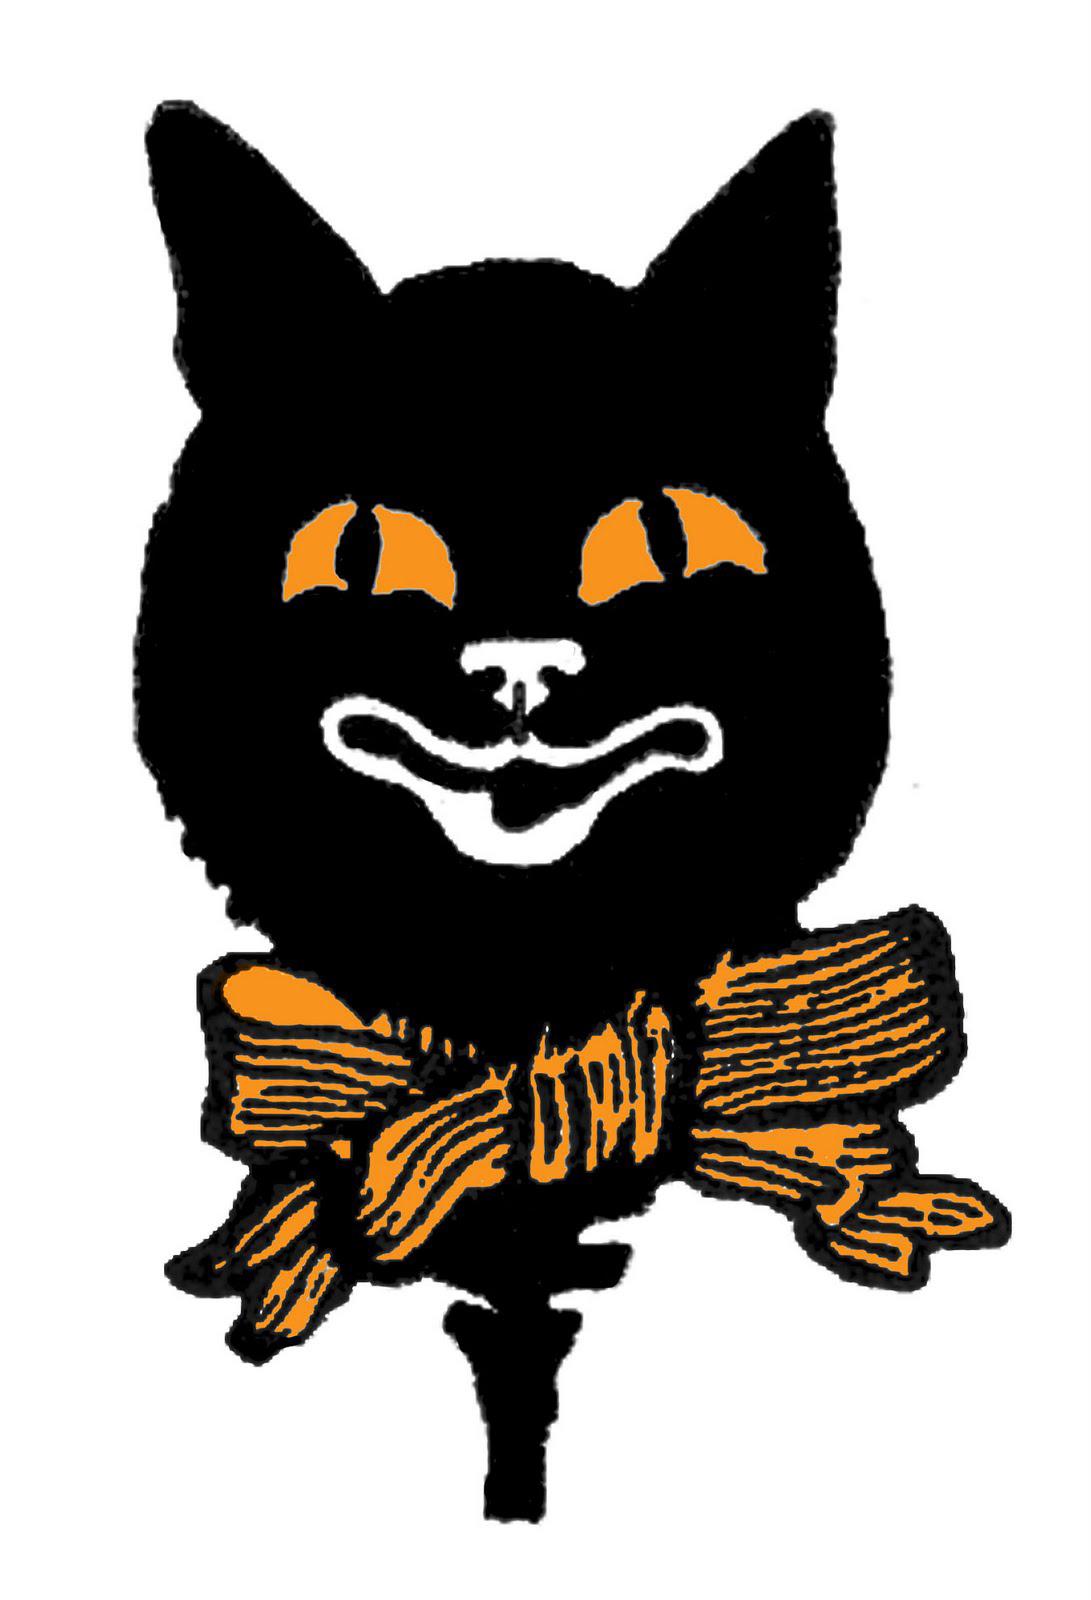 14 Black Cat Clipart - Halloween! - The Graphics Fairy